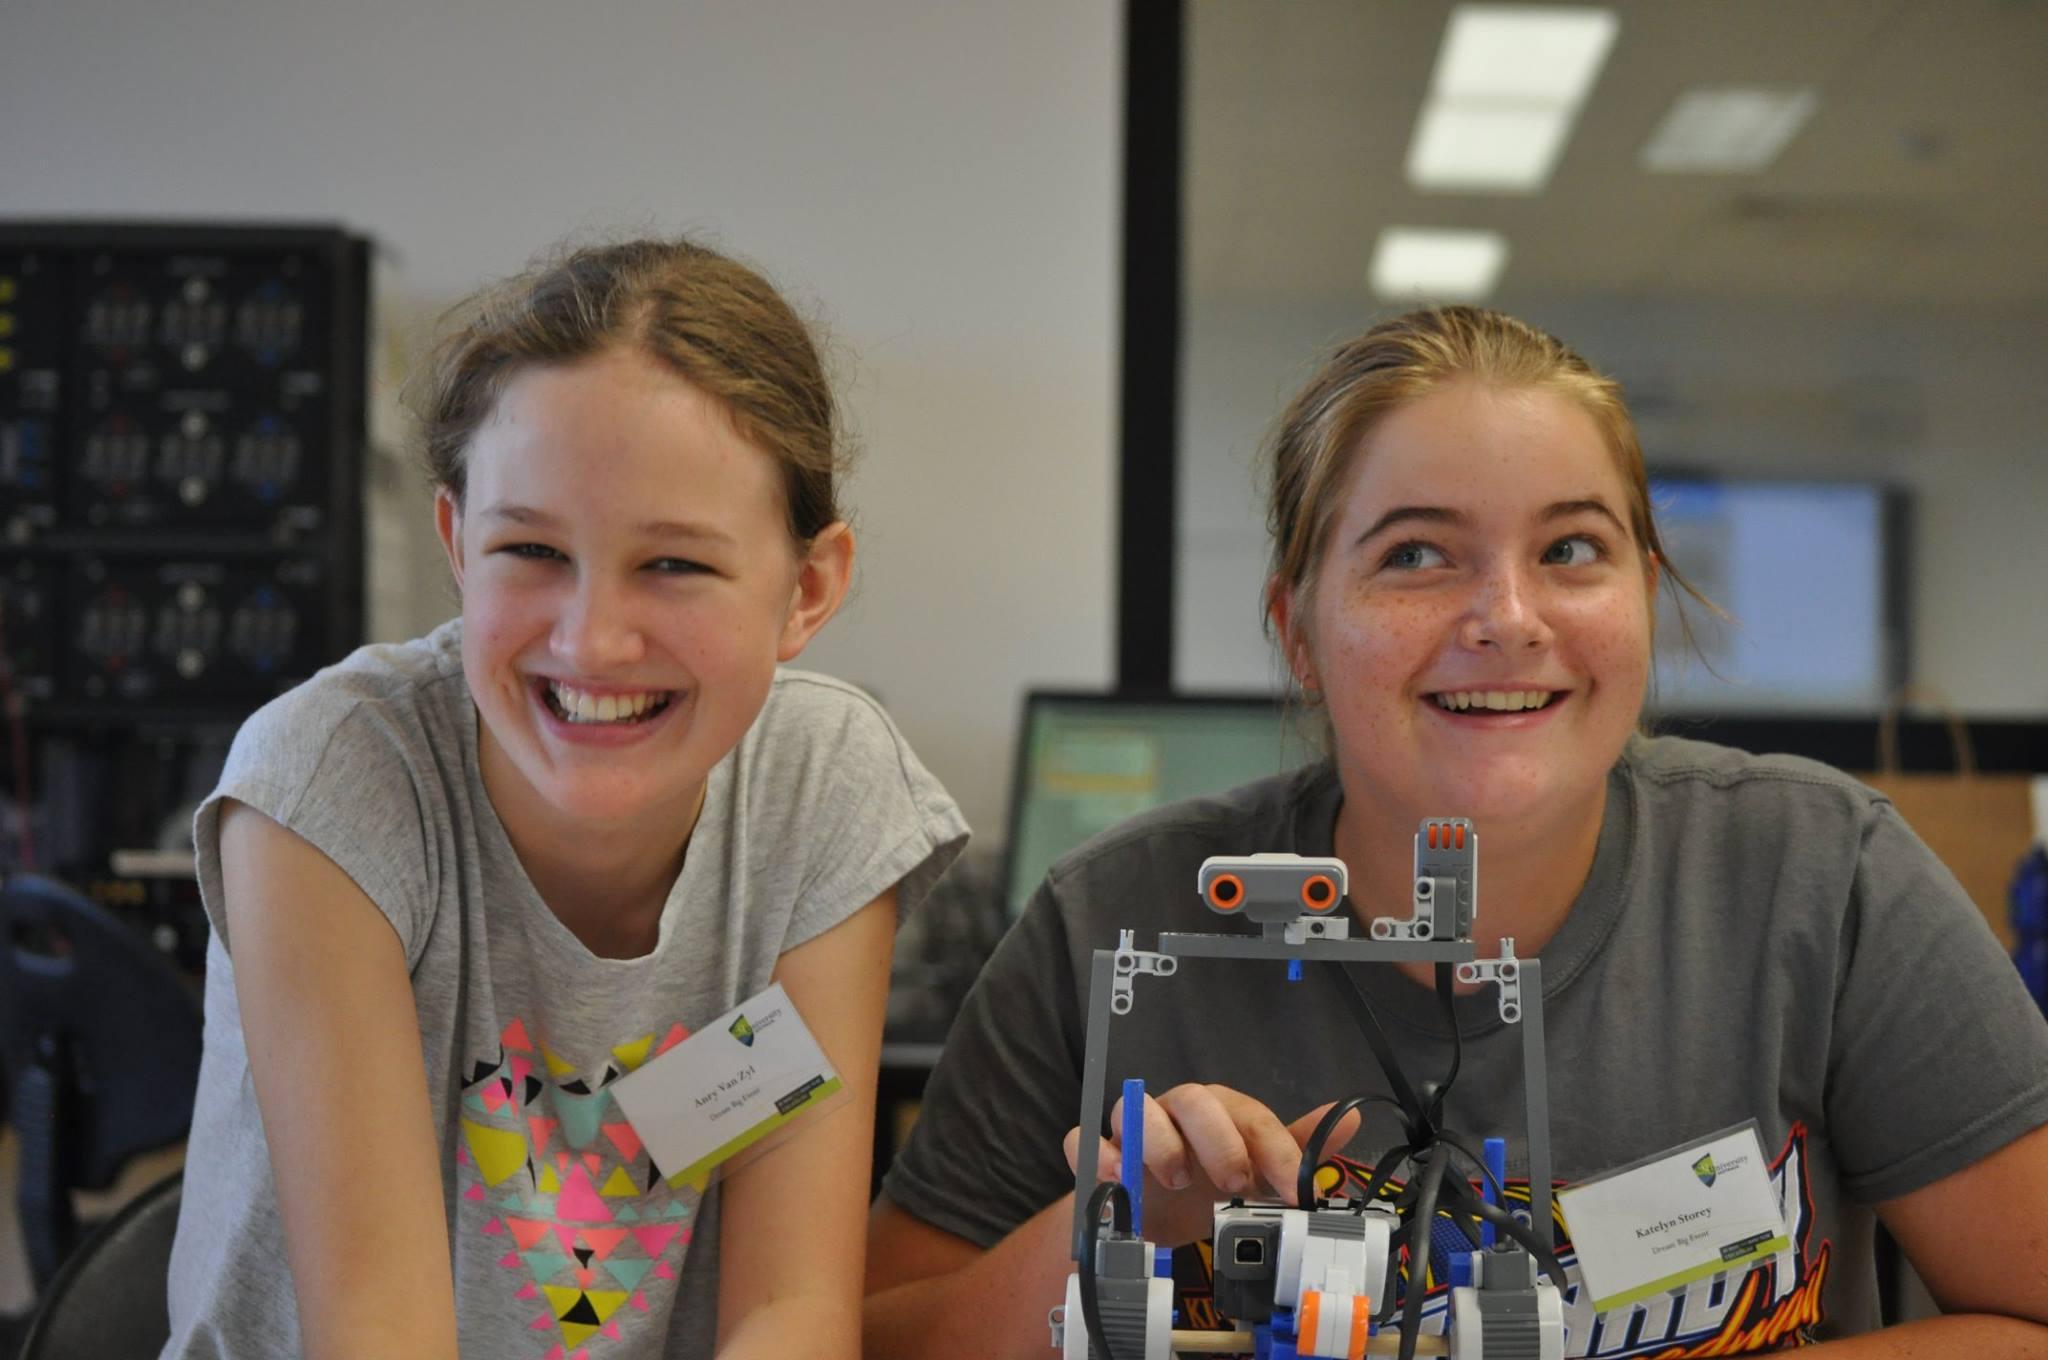 Mindstorms and Robot C programming